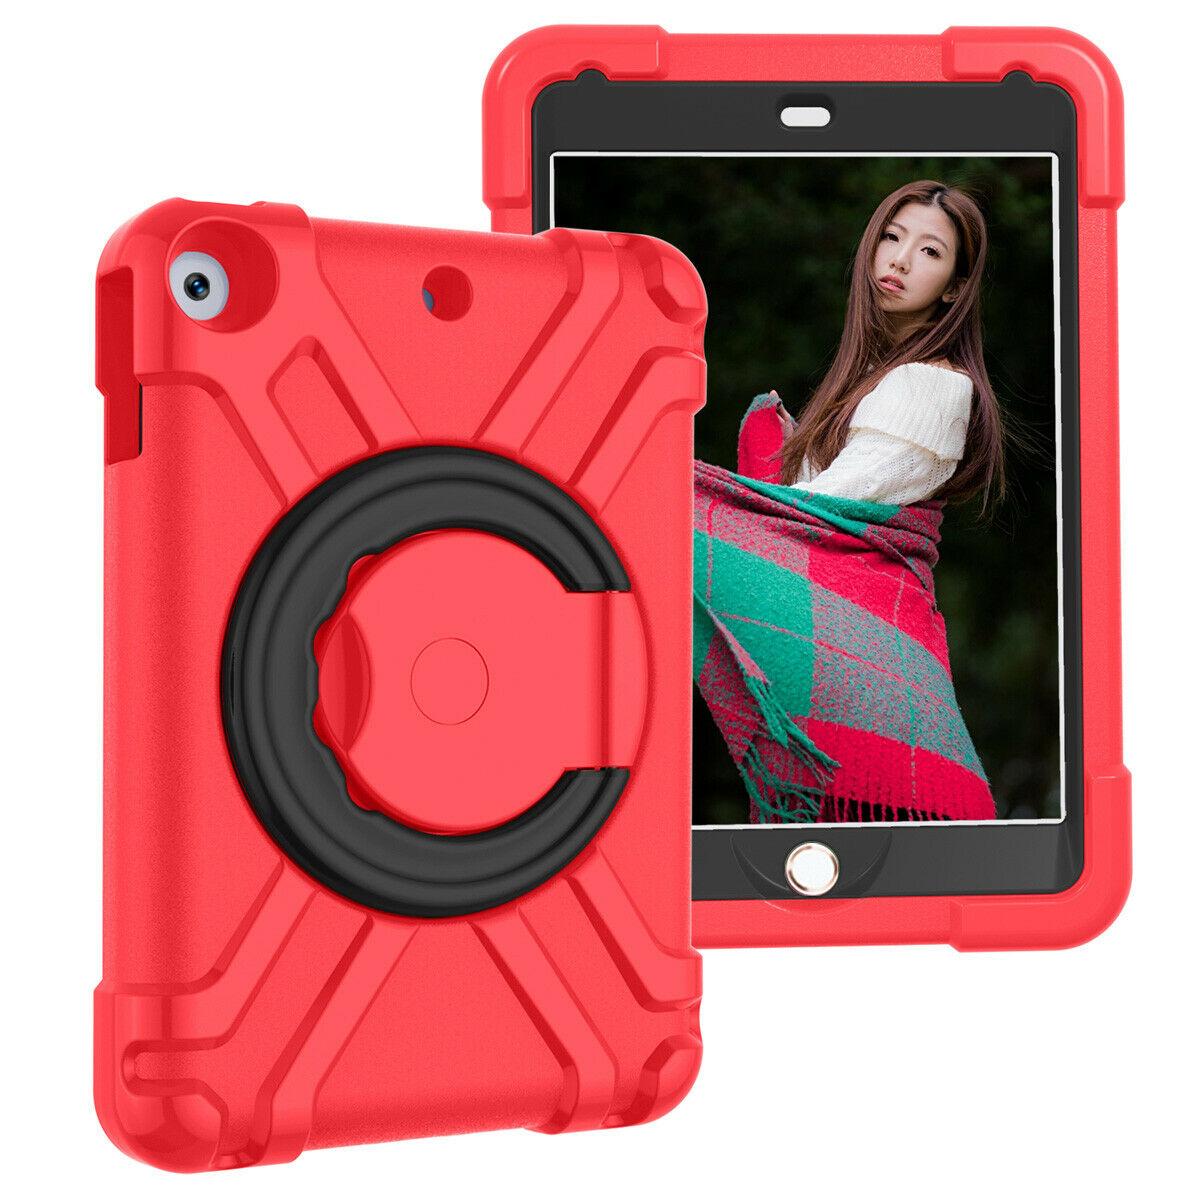 Barnfodral roterbart ställ, 10.2/10.5 iPad Air 3, svart/röd